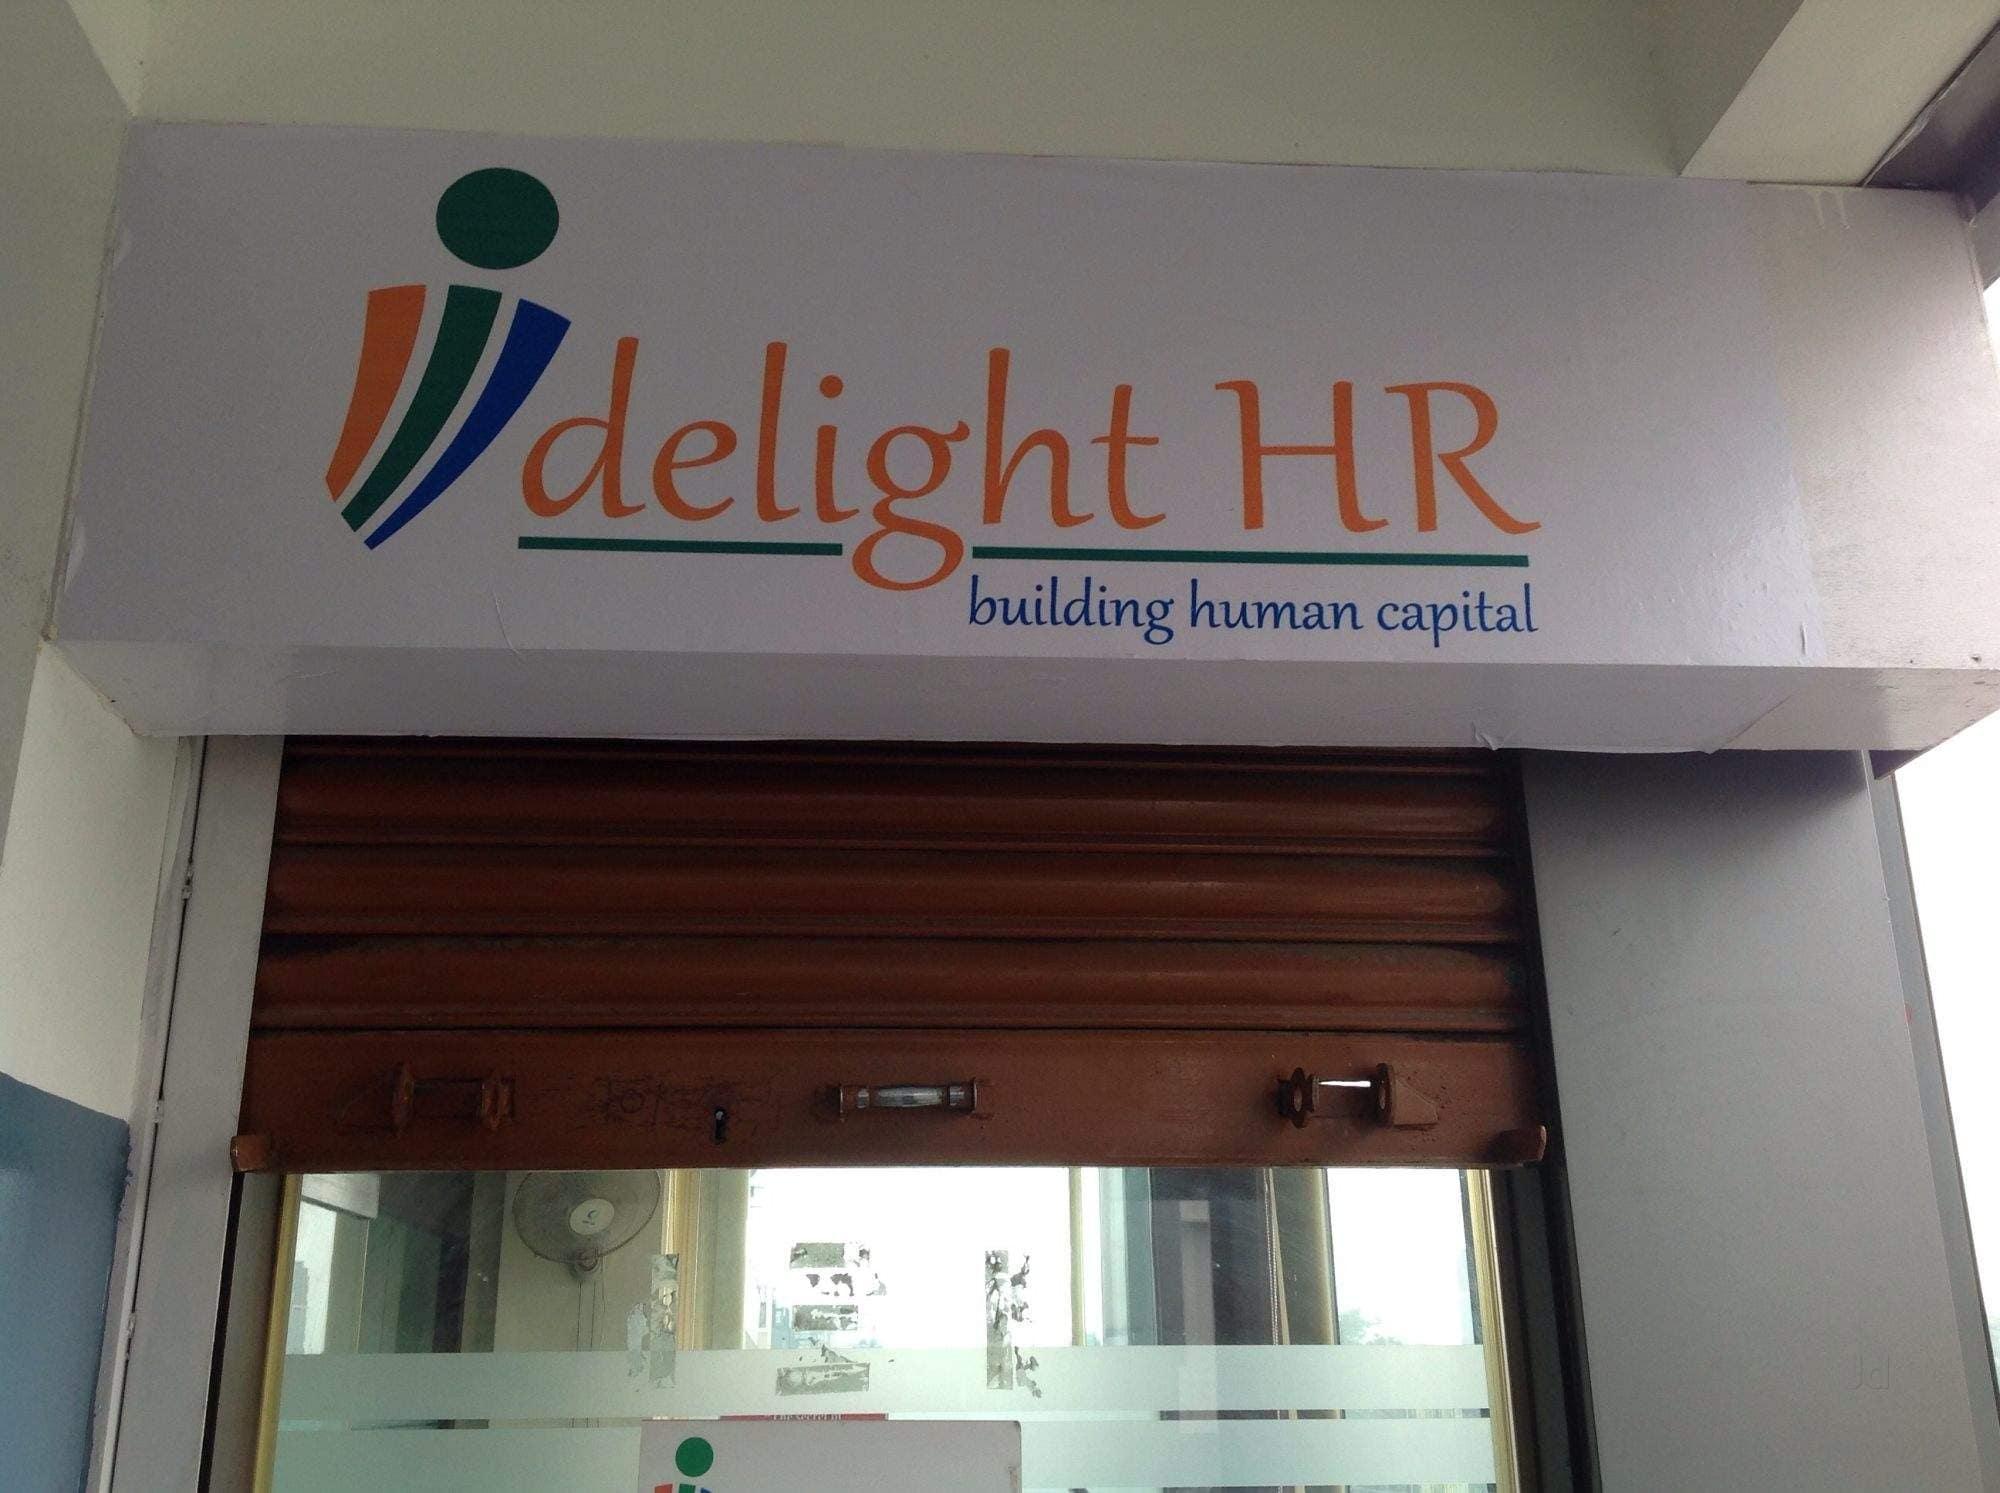 Adecco india headquartered in bangalore dating